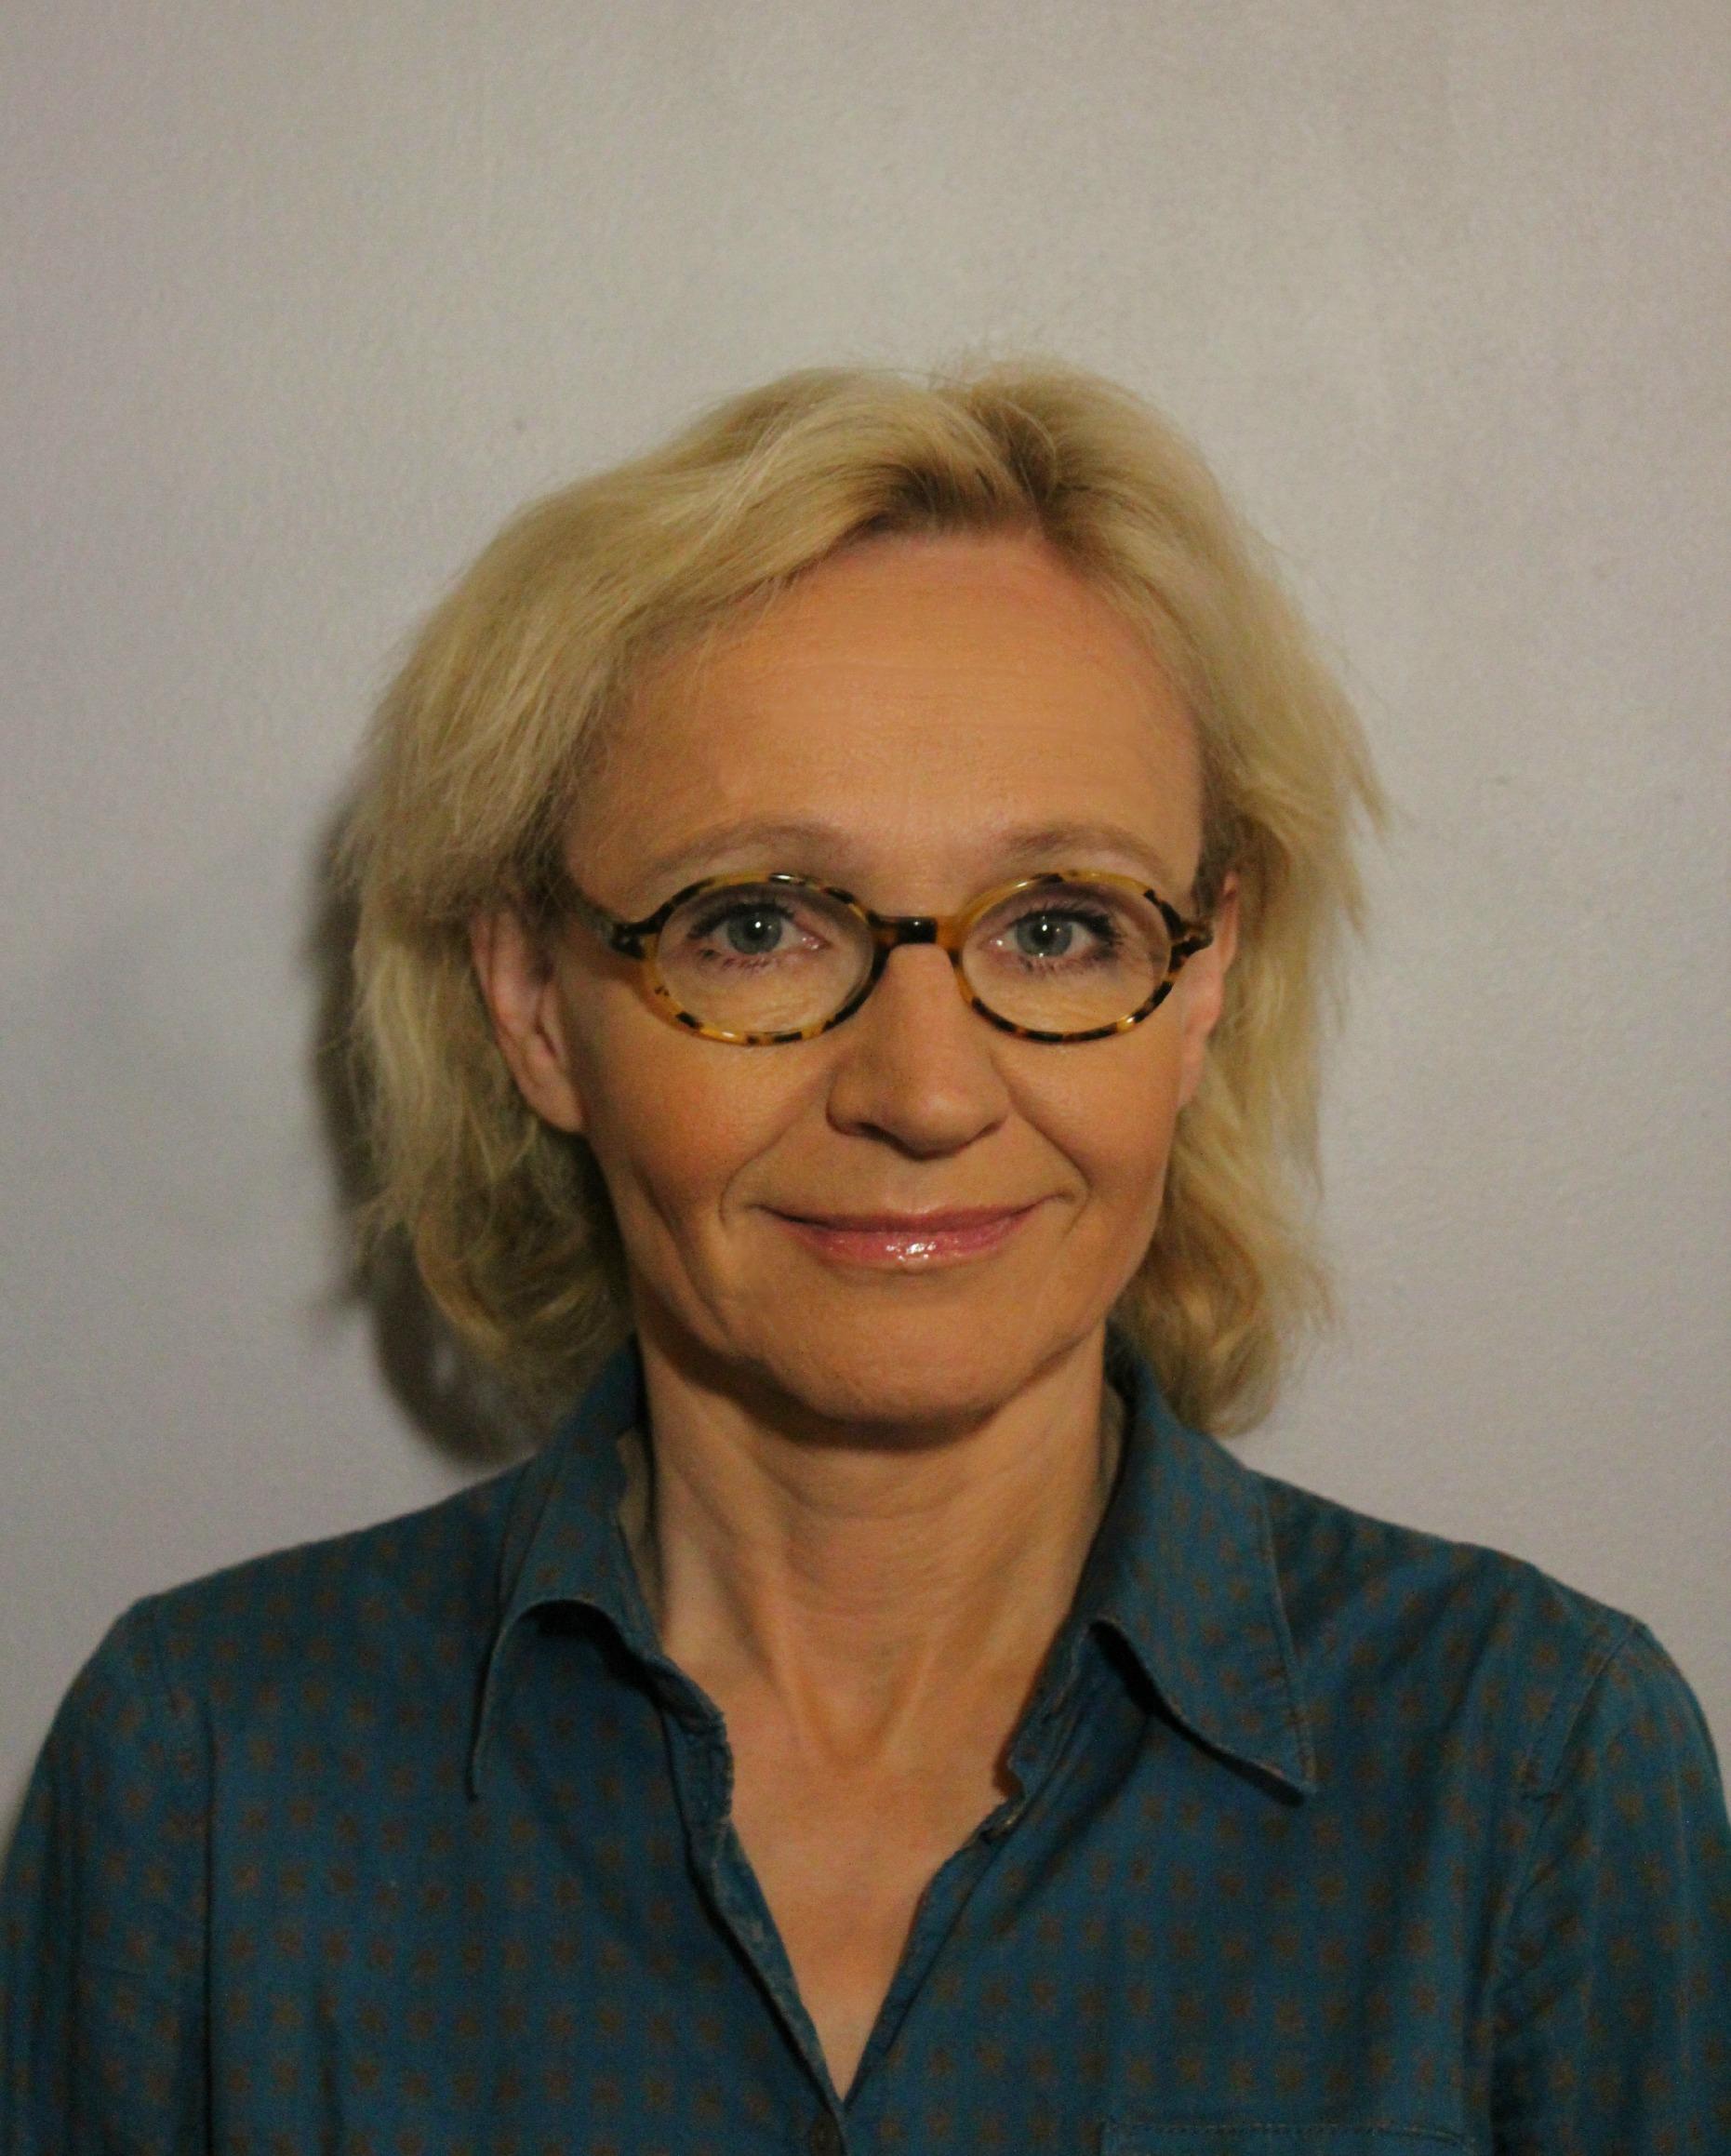 Helena Korpelainen